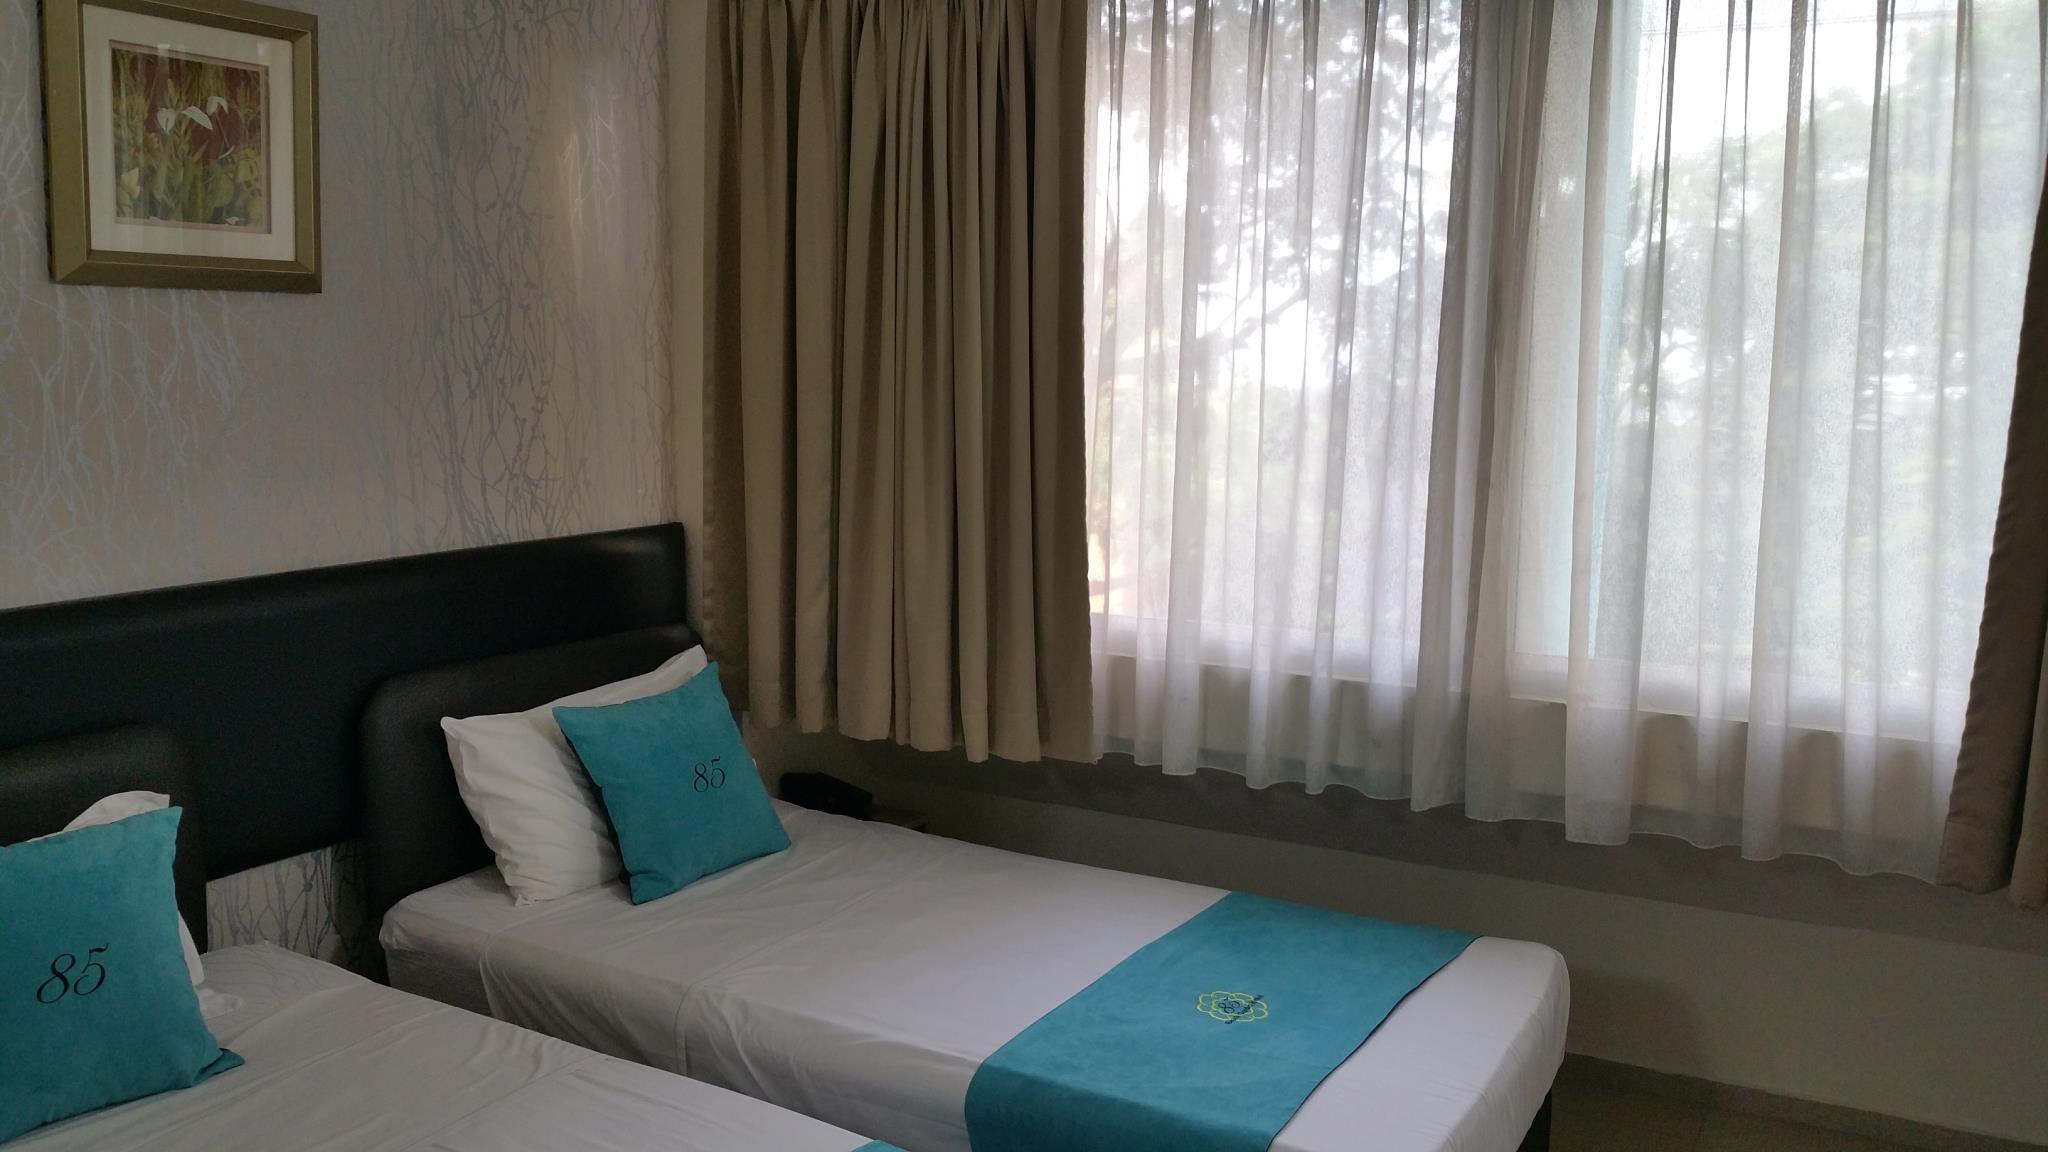 Best Price On 85 Beach Garden Hotel In Singapore + Reviews!